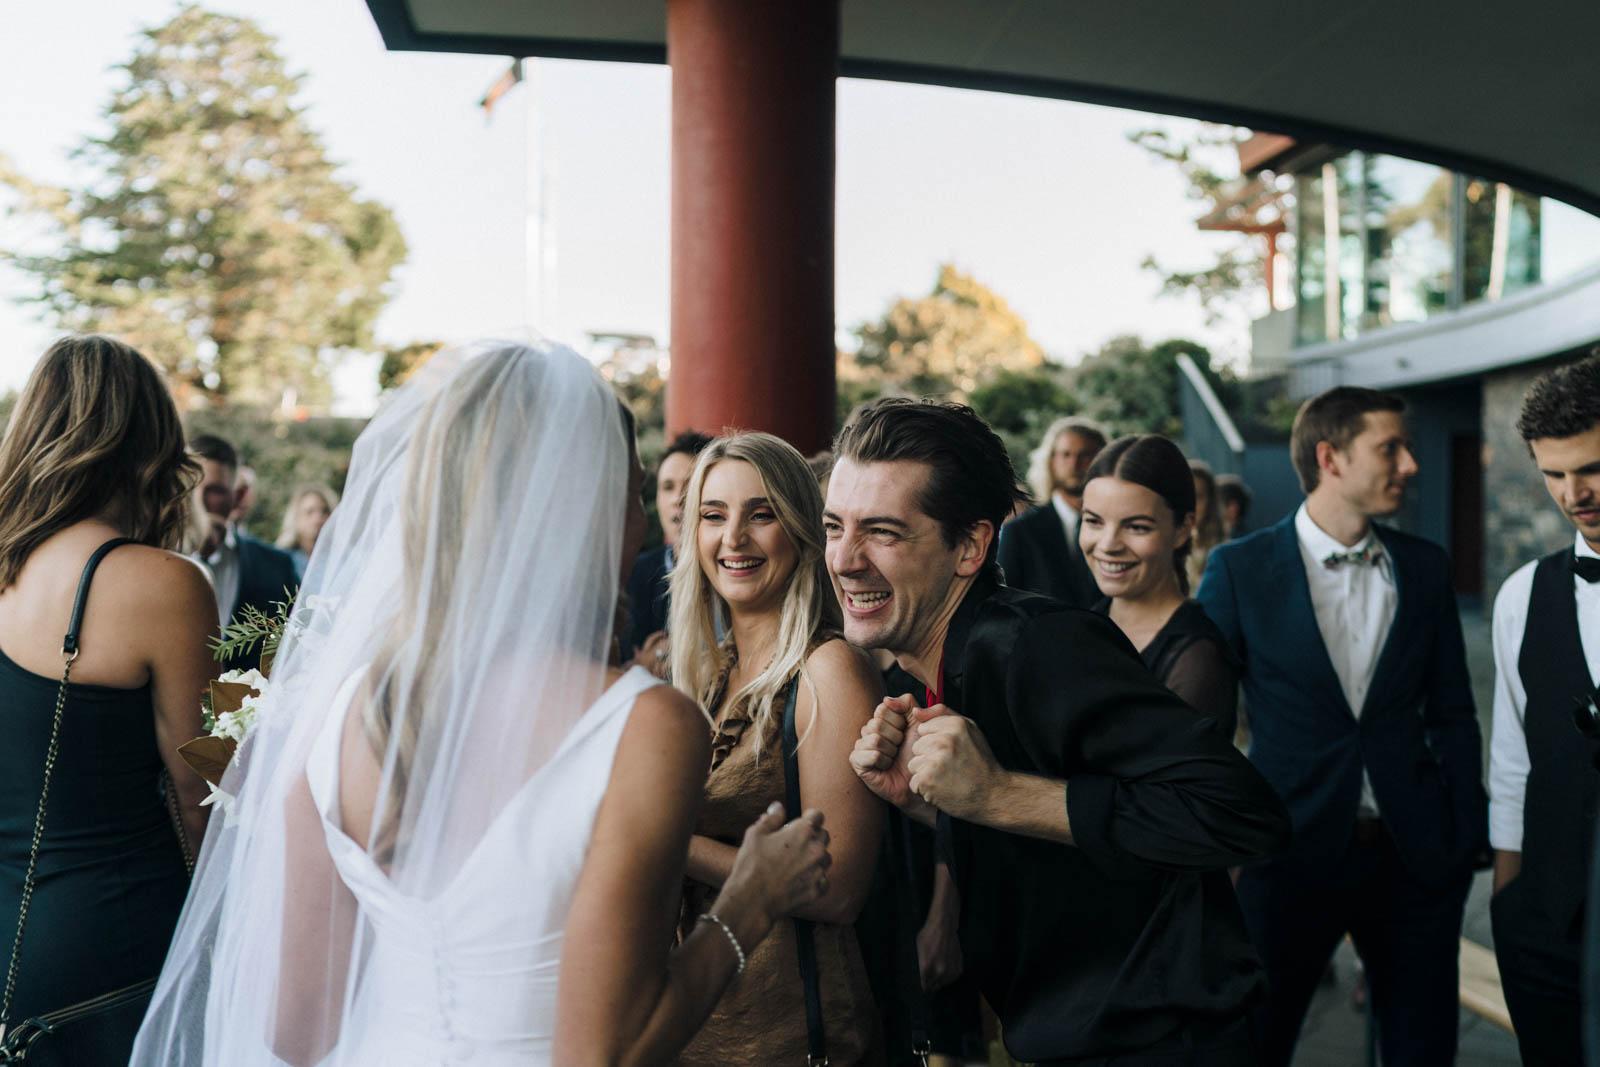 newfound-s-p-mt-maunganui-tauranga-wedding-photographer-1721-A9_06914